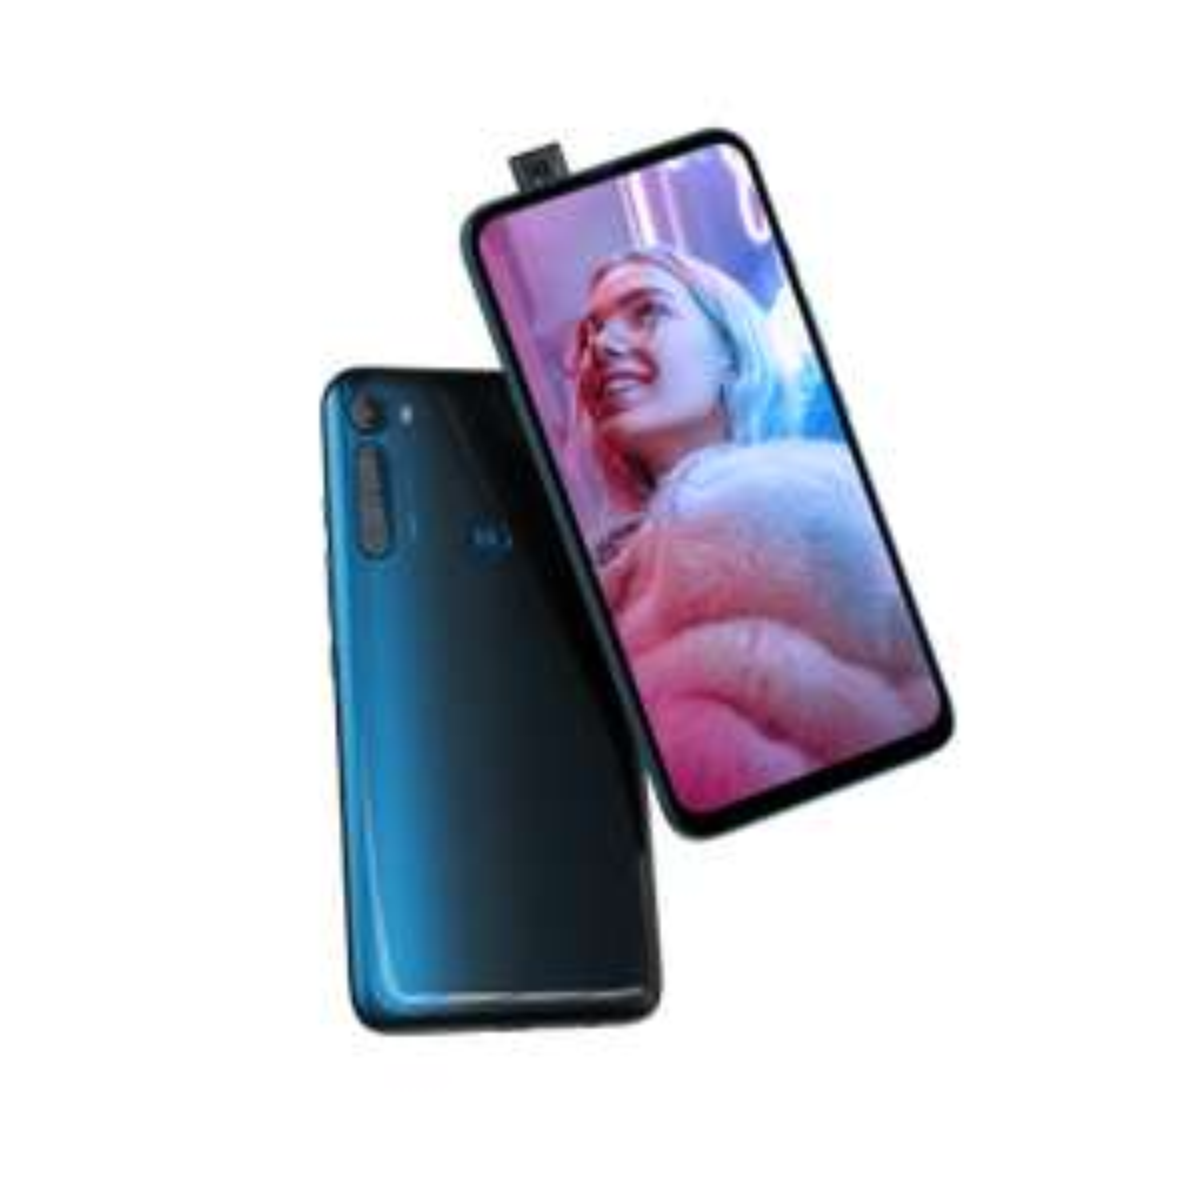 Motorola One Fusion plus - Twilight Blue - 128 GB Speicher - GB RAM - inkl. kabellose Kopfhörer/ einer Soundbox